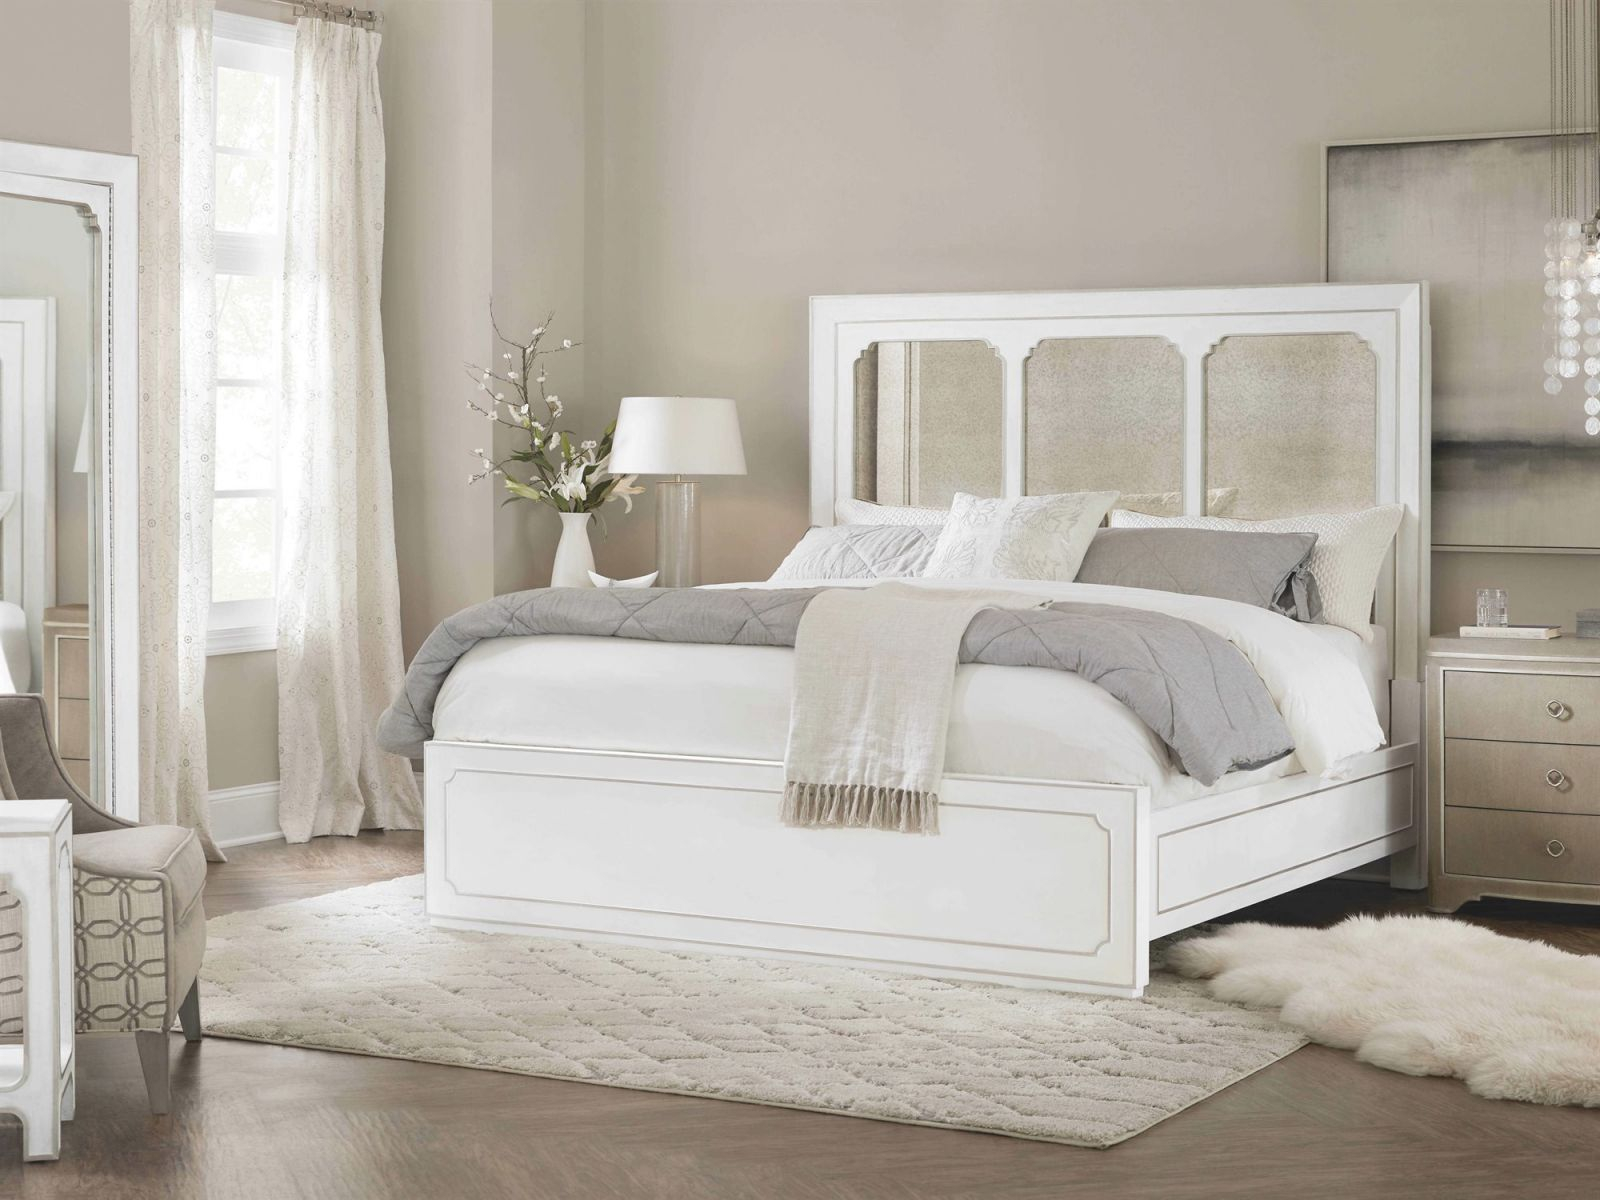 Hooker Furniture Modern Romance Bedroom Set for Luxury Bedroom Set Modern